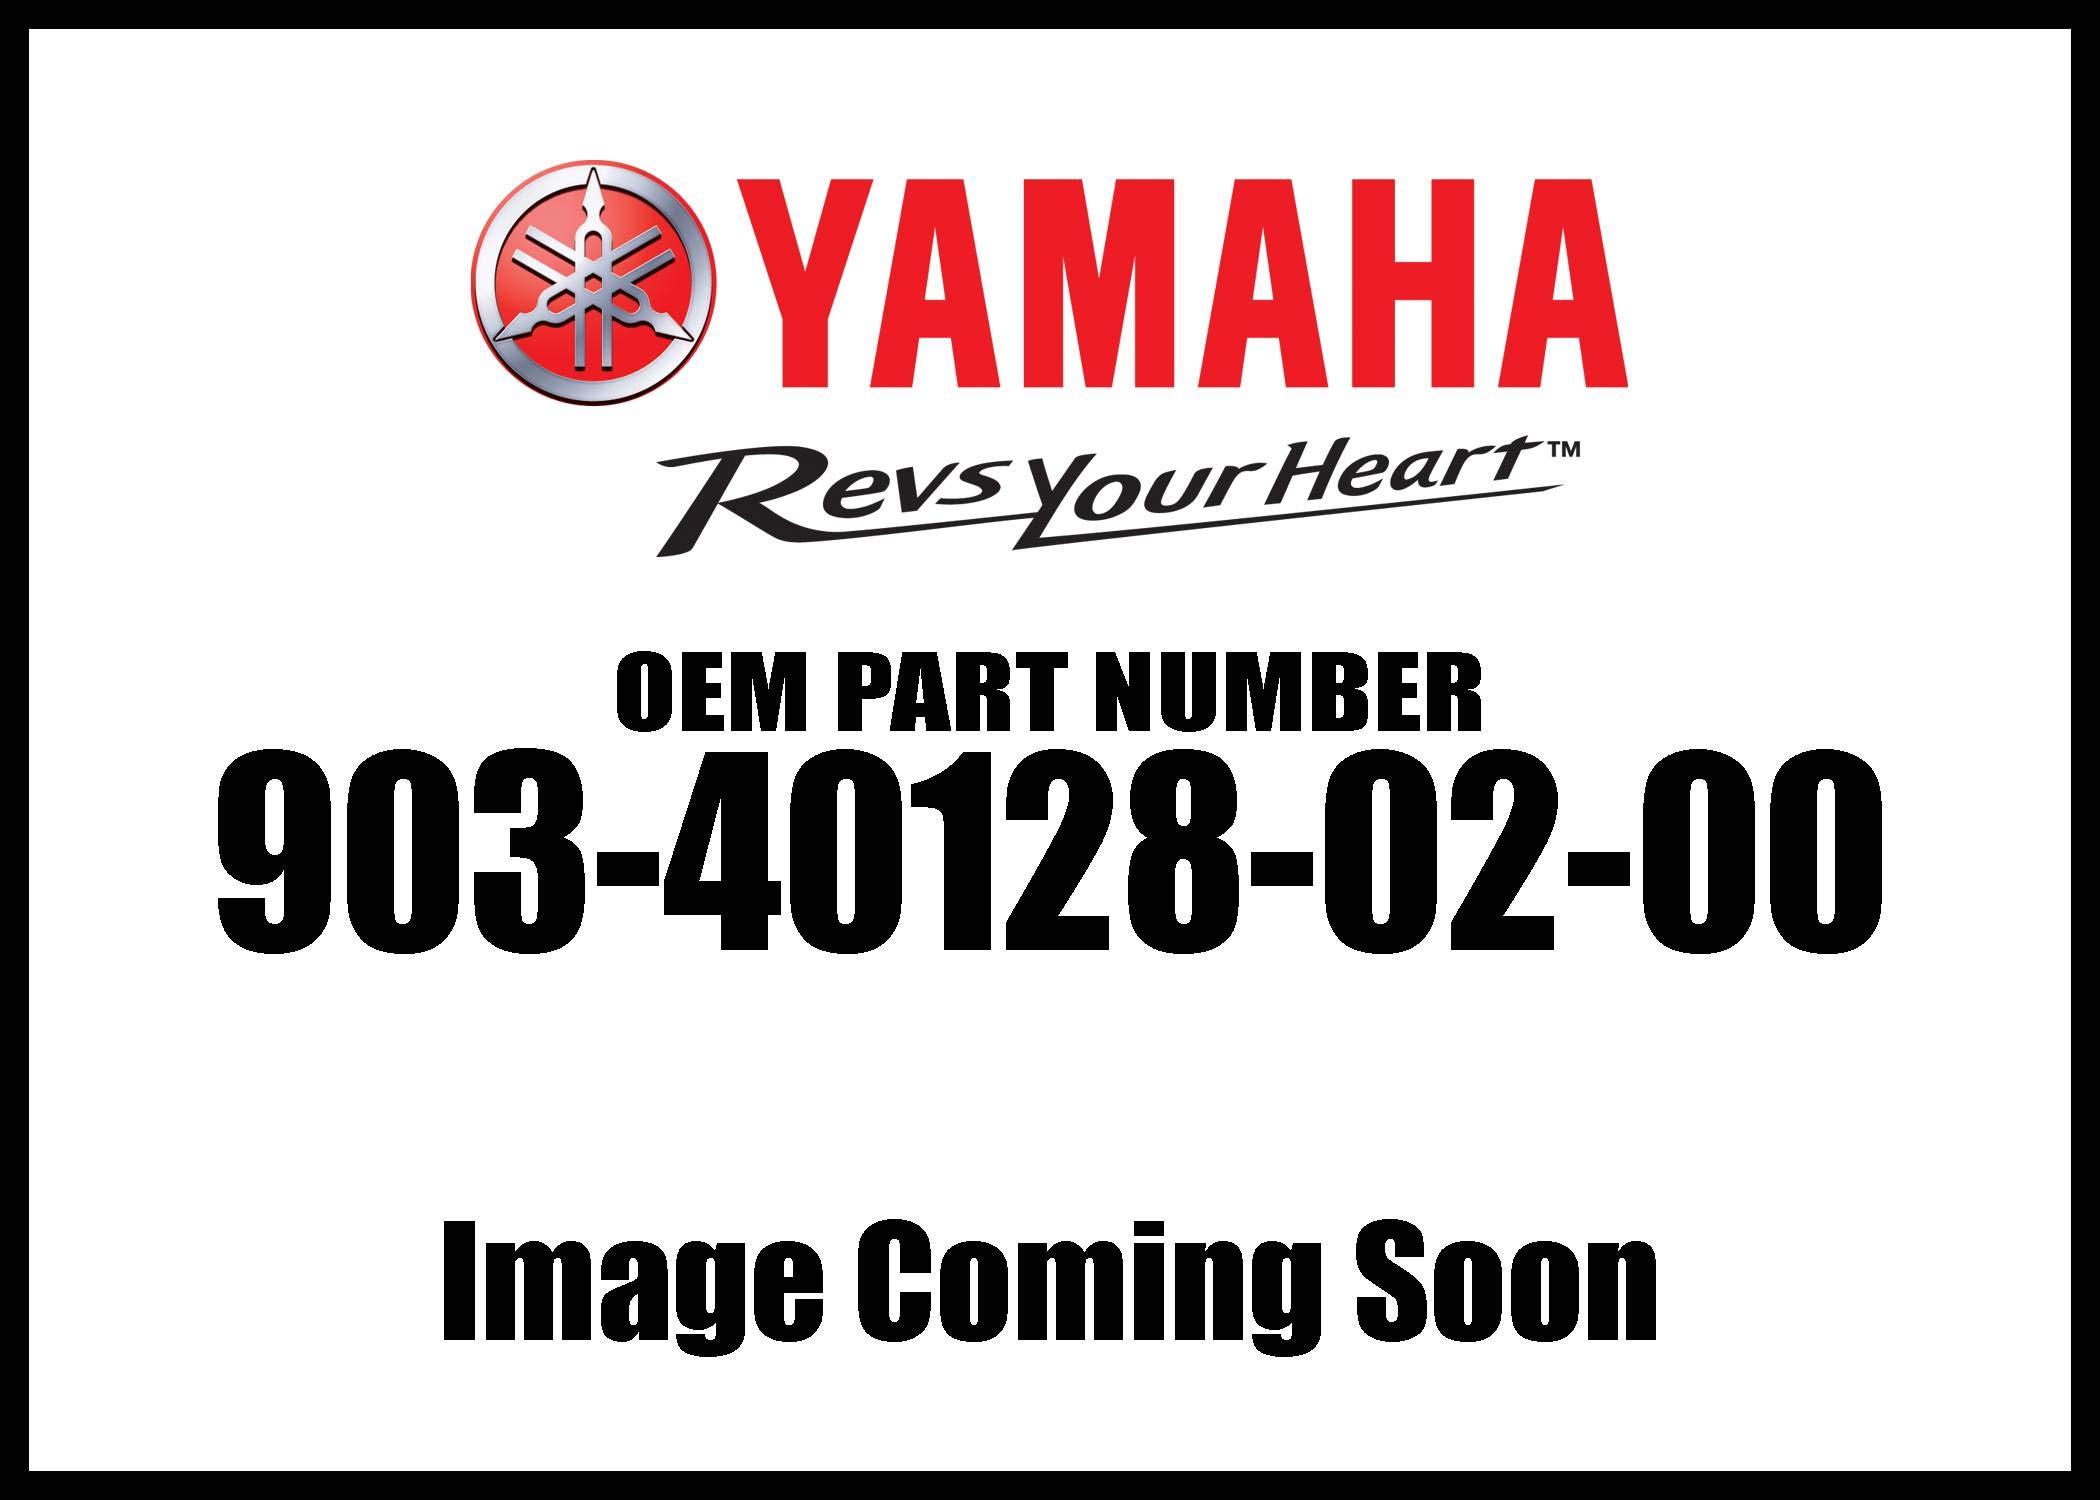 Yamaha 90340-12802-00 Plug, Straight Scr; 903401280200 Made by Yamaha